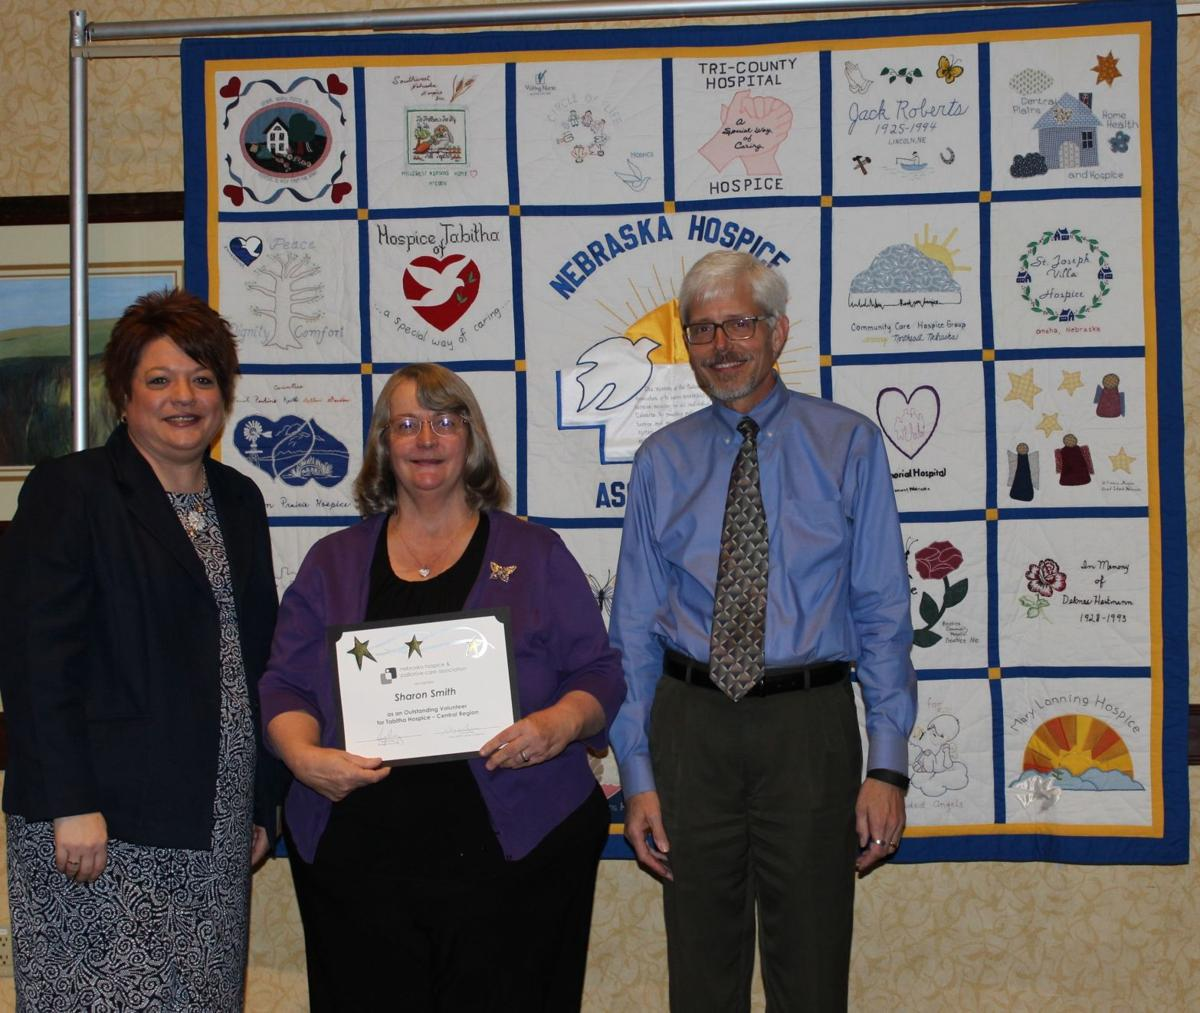 Volunteering In Lincoln Ne: Tabitha Hospice Volunteer And Staff Member Spotlighted